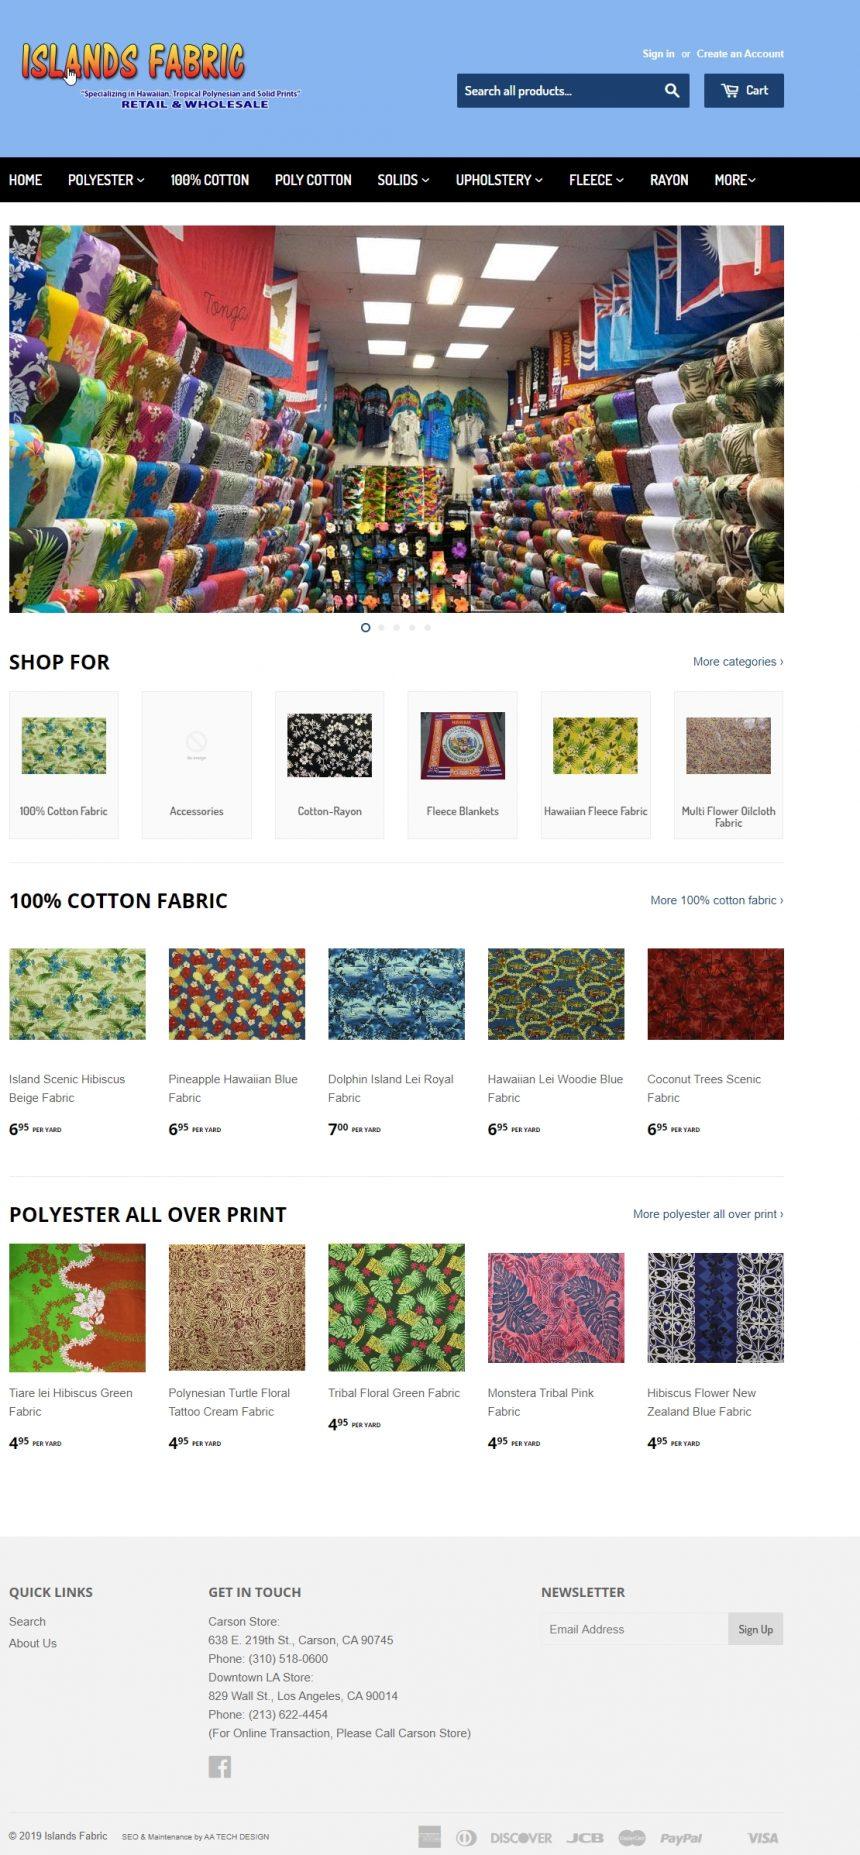 Fabric Retail Website IslandsFabric.com